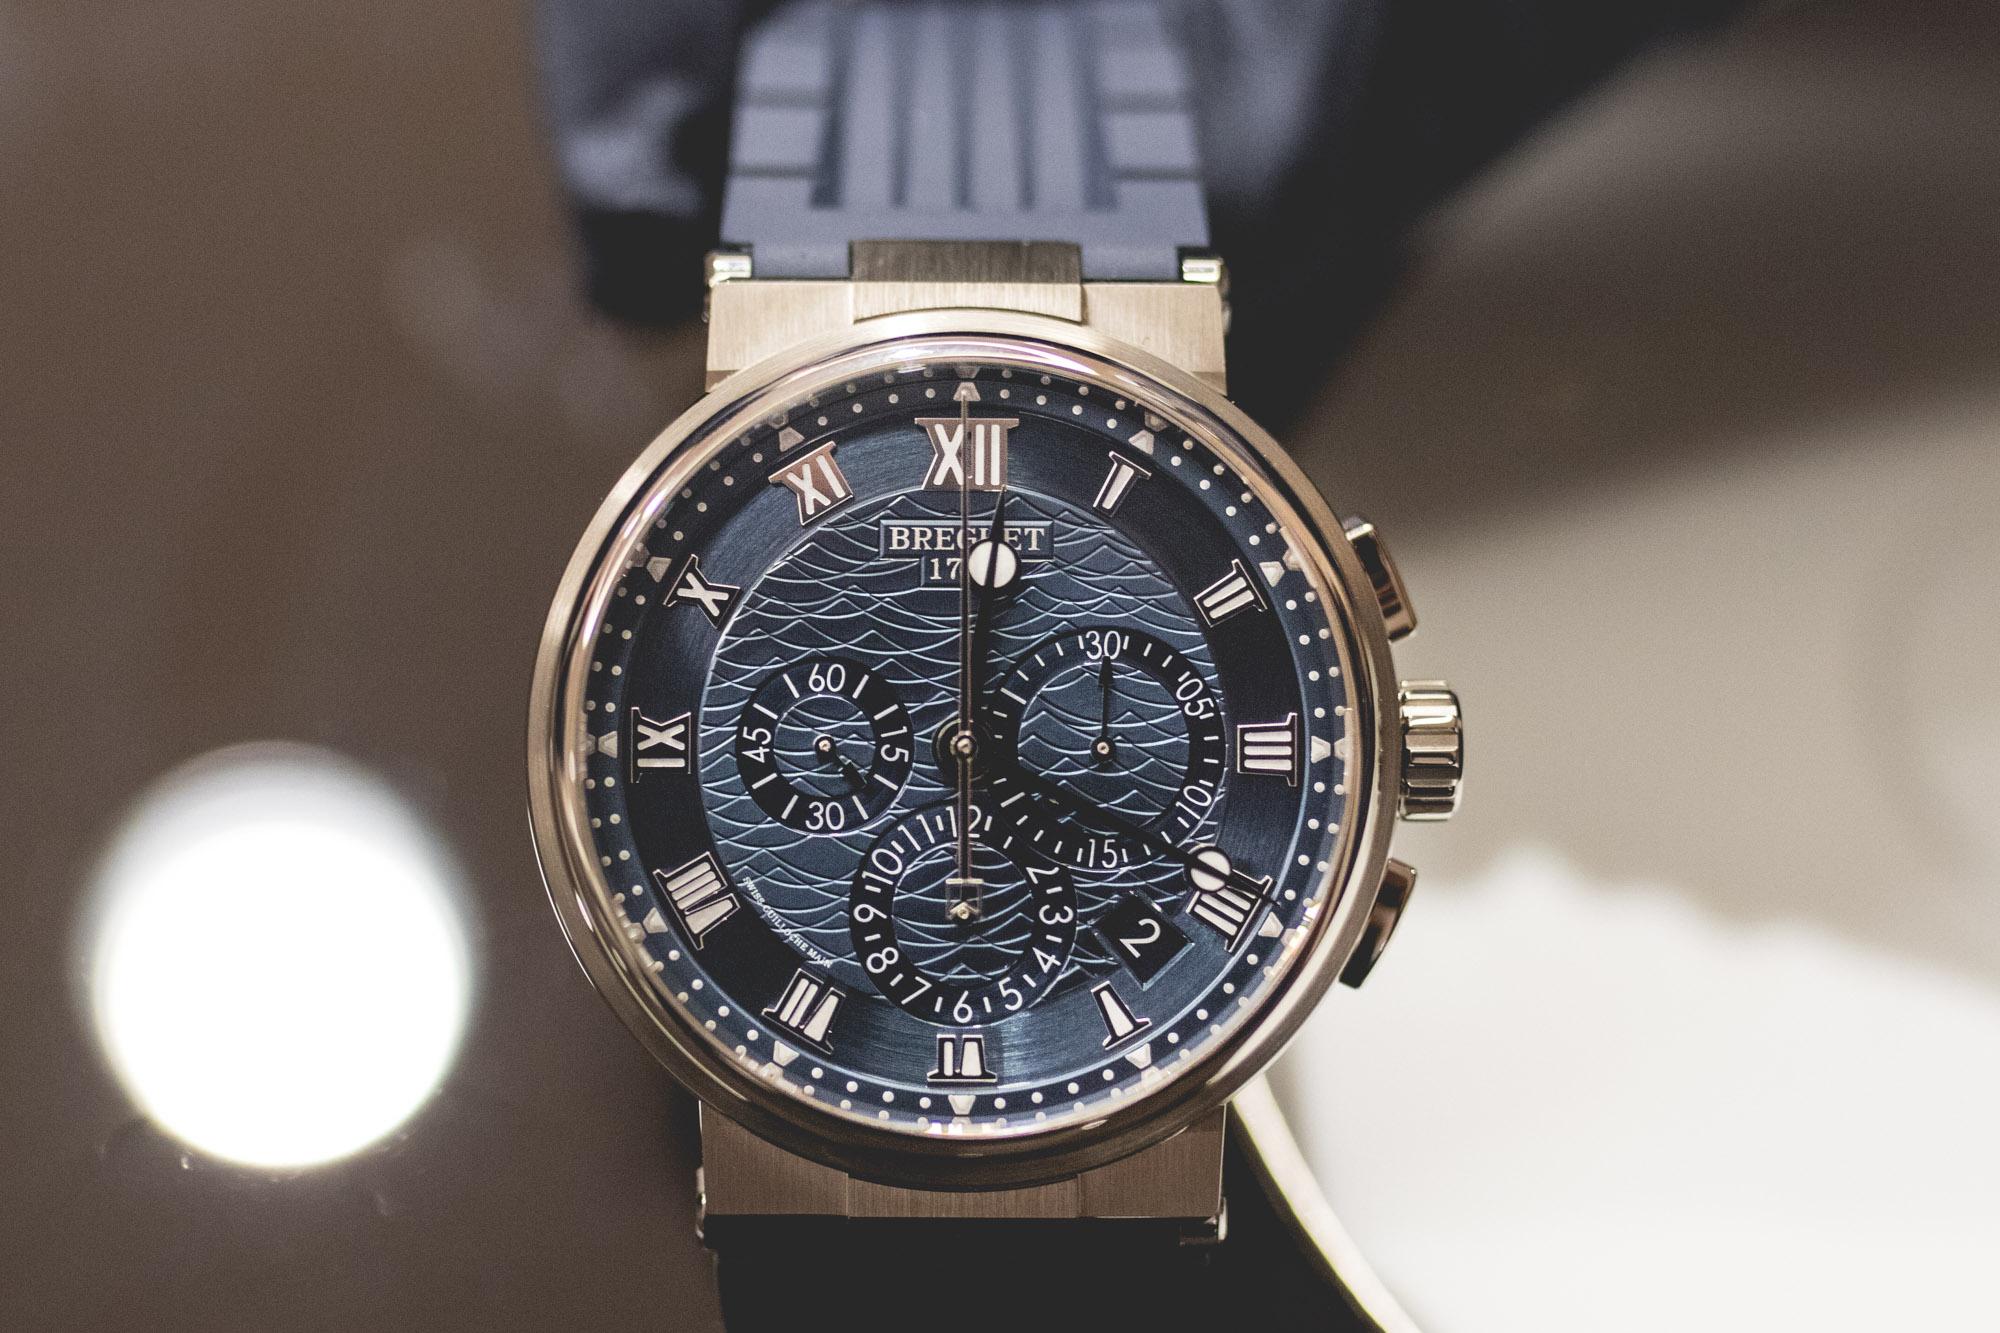 Baselworld 2018 - Breguet Marine Chronographe 5527 Cadran